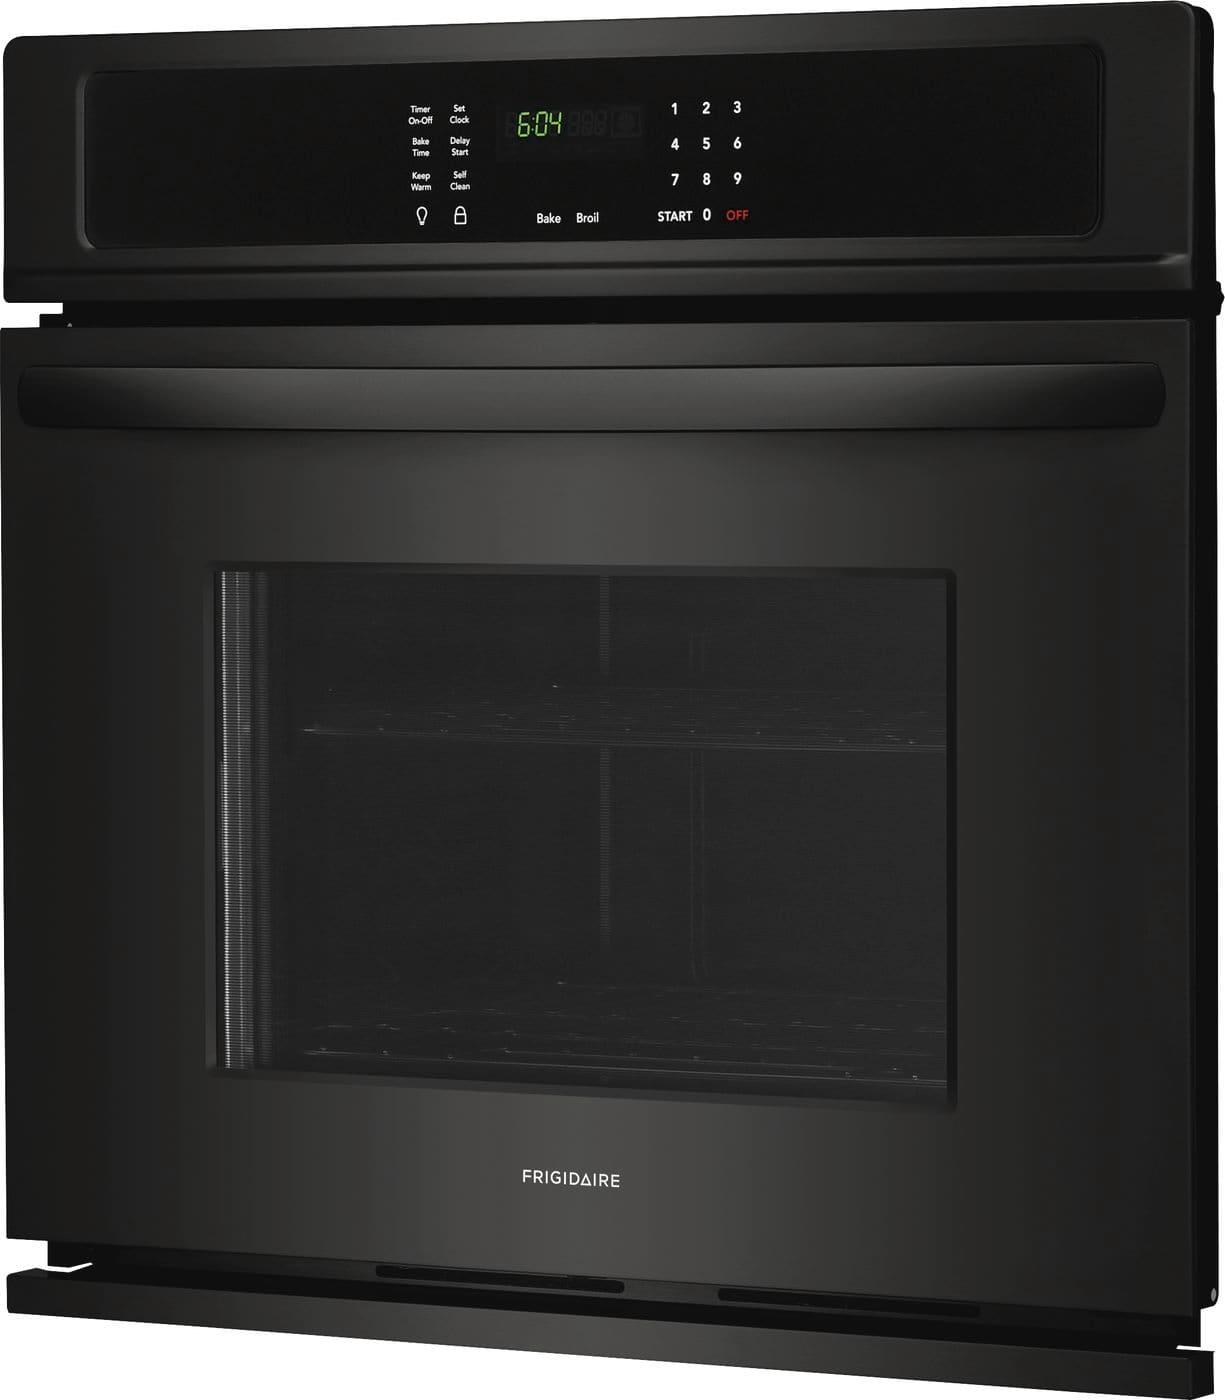 "Model: FFEW3026TB | Frigidaire 30"" Single Electric Wall Oven"